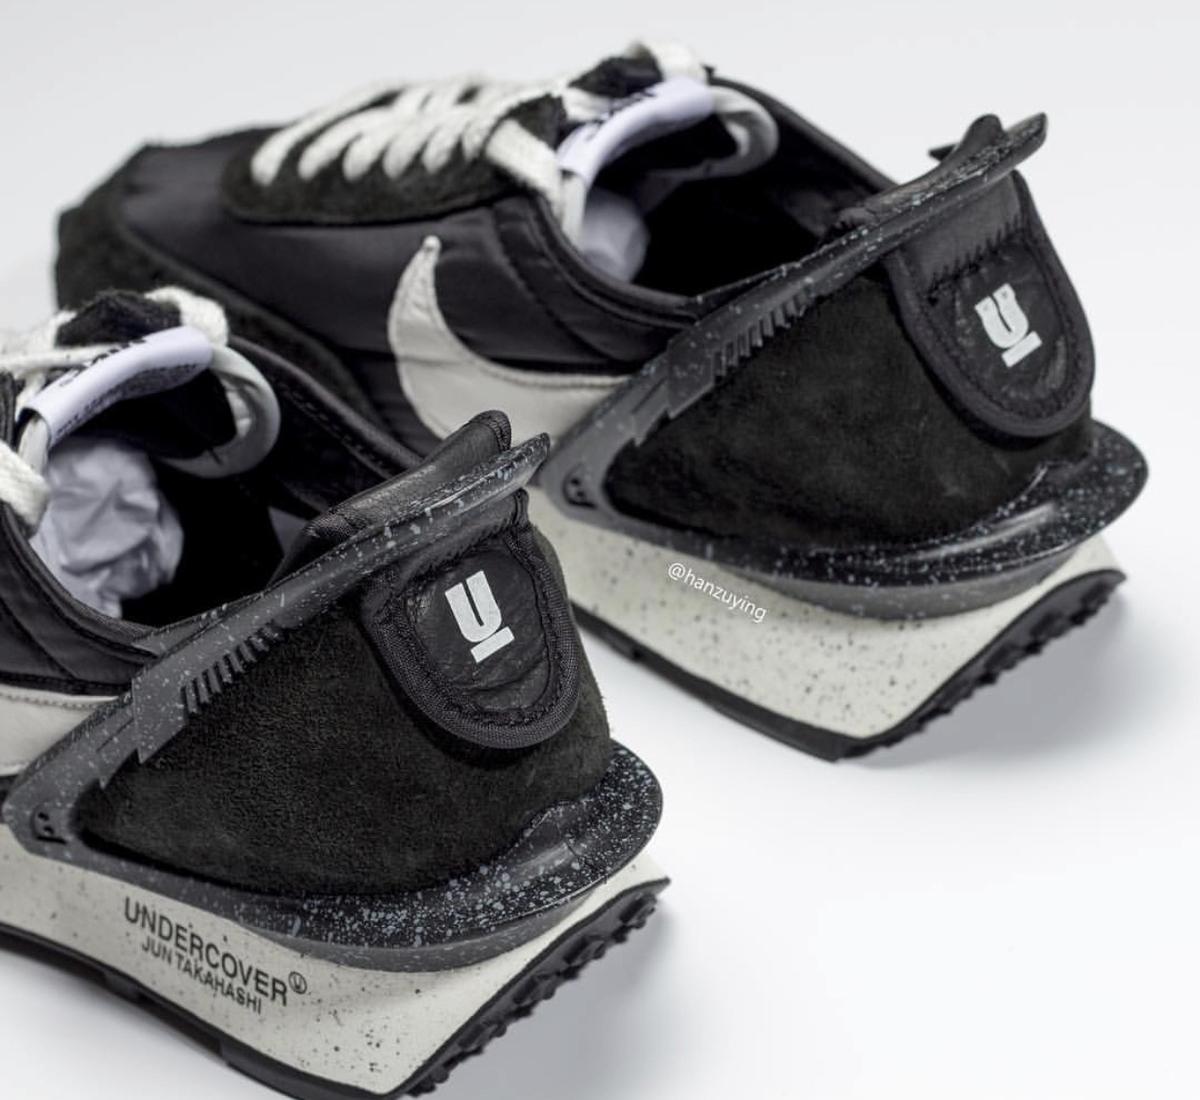 f:id:sneakerscaffetokyo:20190531191457j:plain